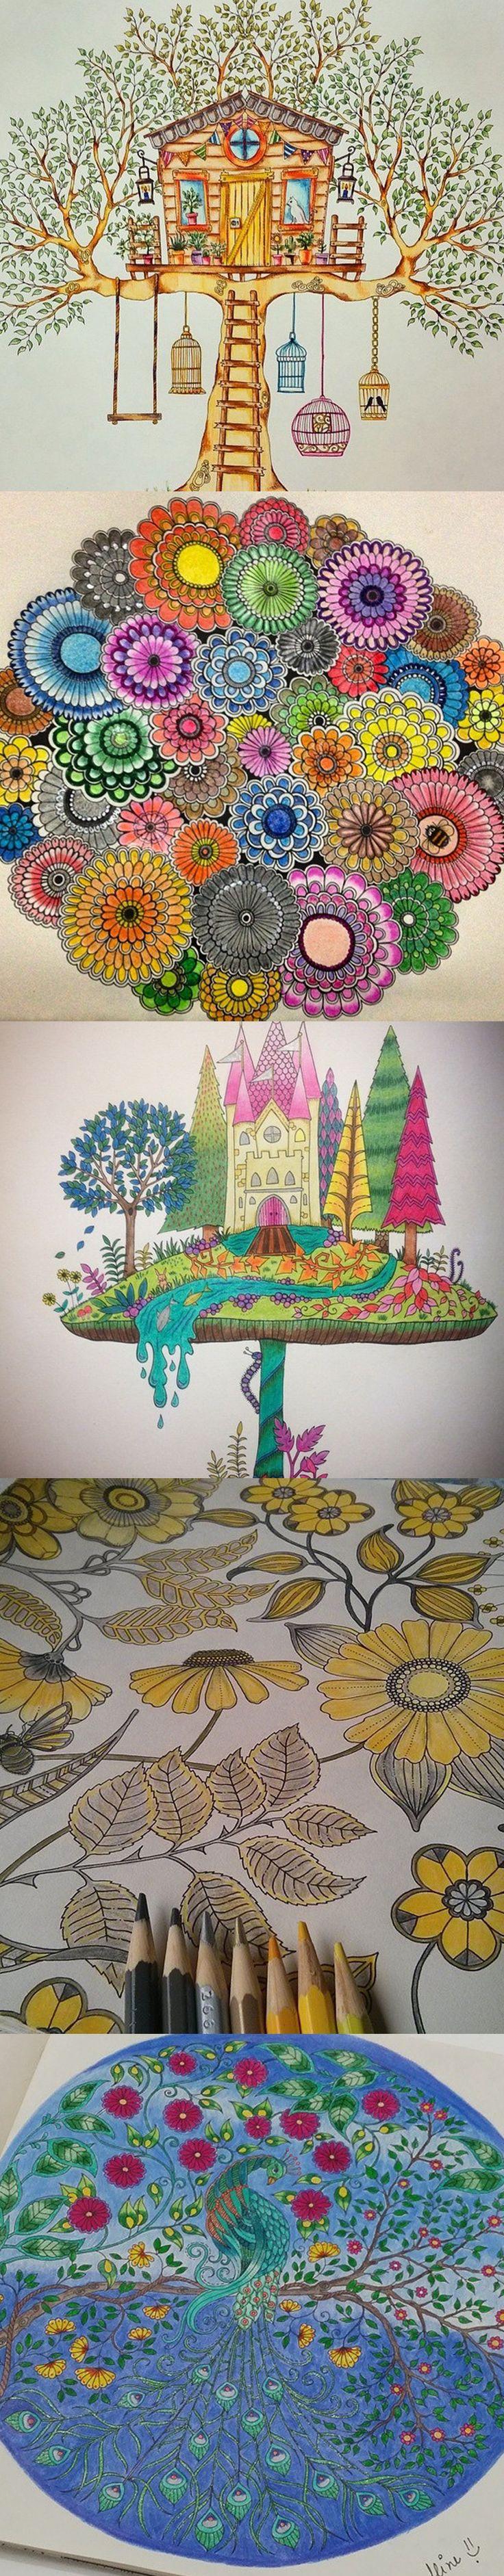 117 best beautiful coloring images on pinterest books mandalas